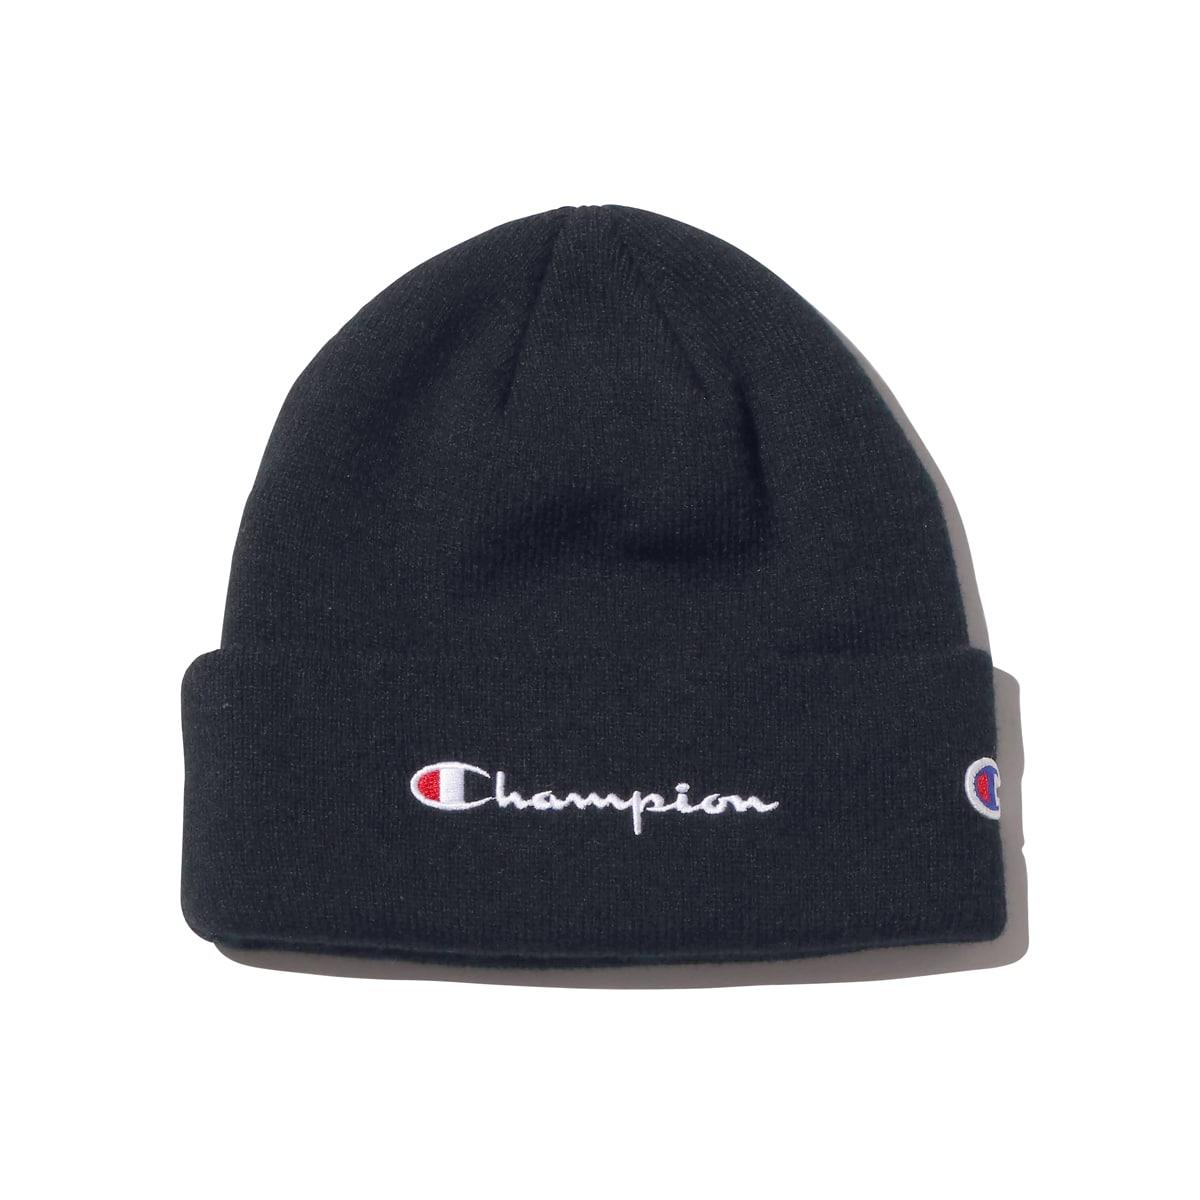 CHAMPION x ATMOS LAB KNIT CAP BLACK 18FW-I_photo_large